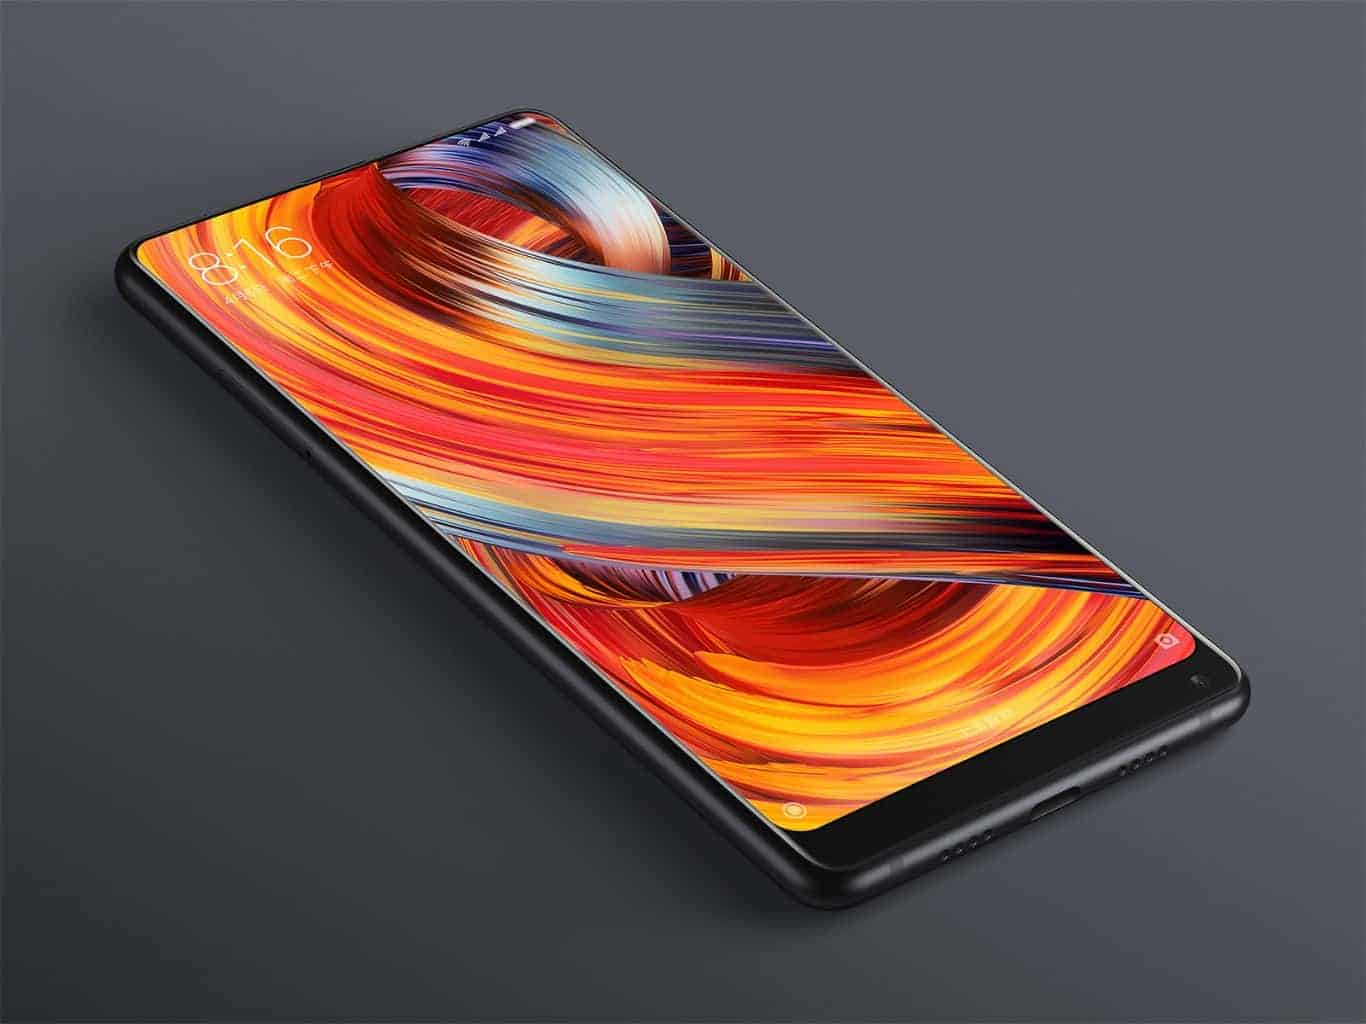 Xiaomi Mi MIX 2 official image 6